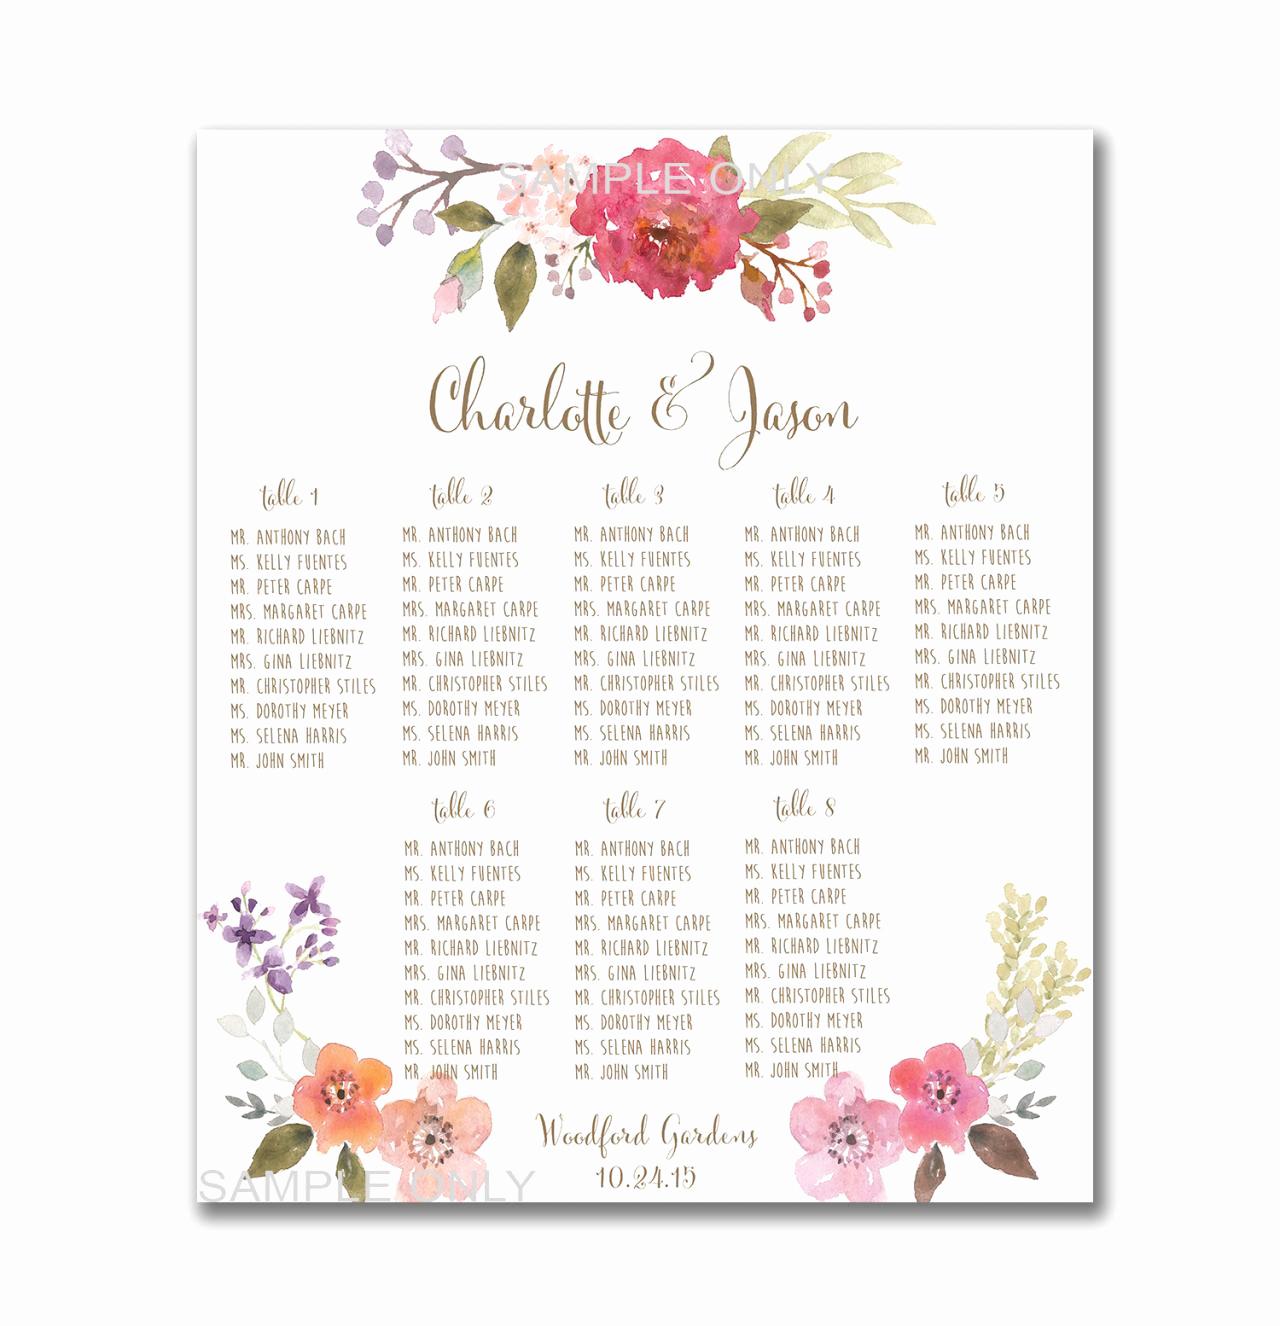 Wedding Table Seating Chart Fresh Wedding Table Seating Chart Printable 50 130 Guests